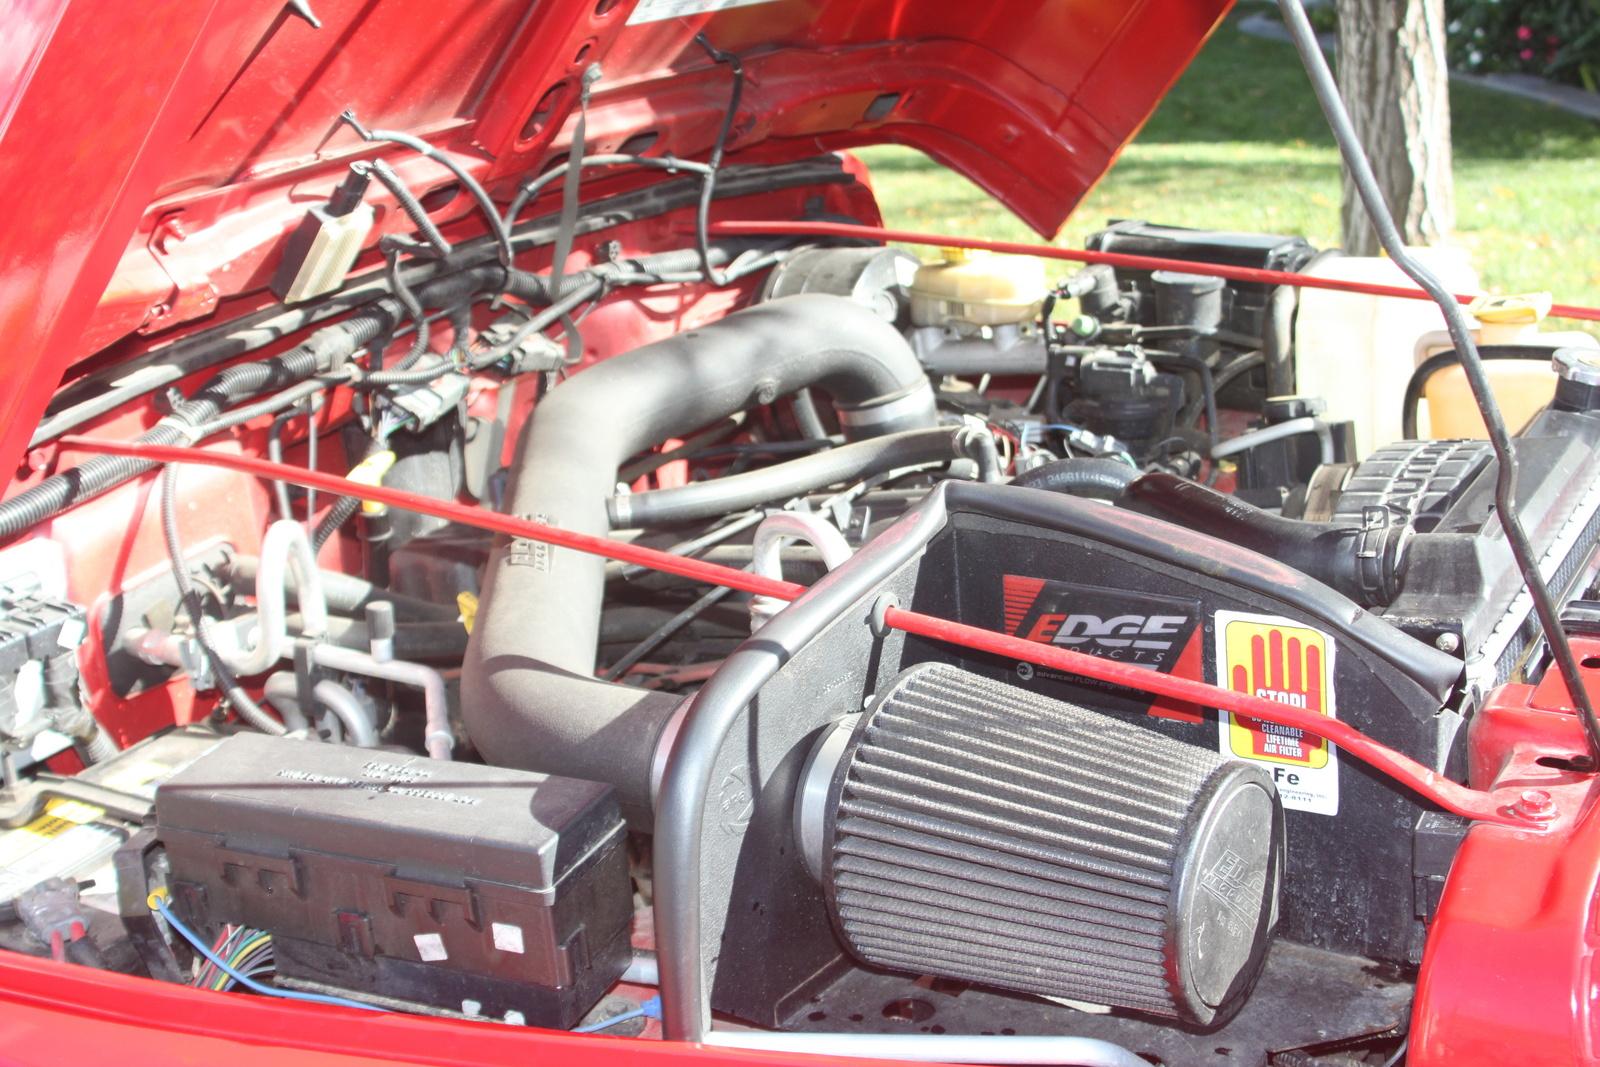 Jeep Wrangler Sport Pic on P0700 Dodge Ram 1500